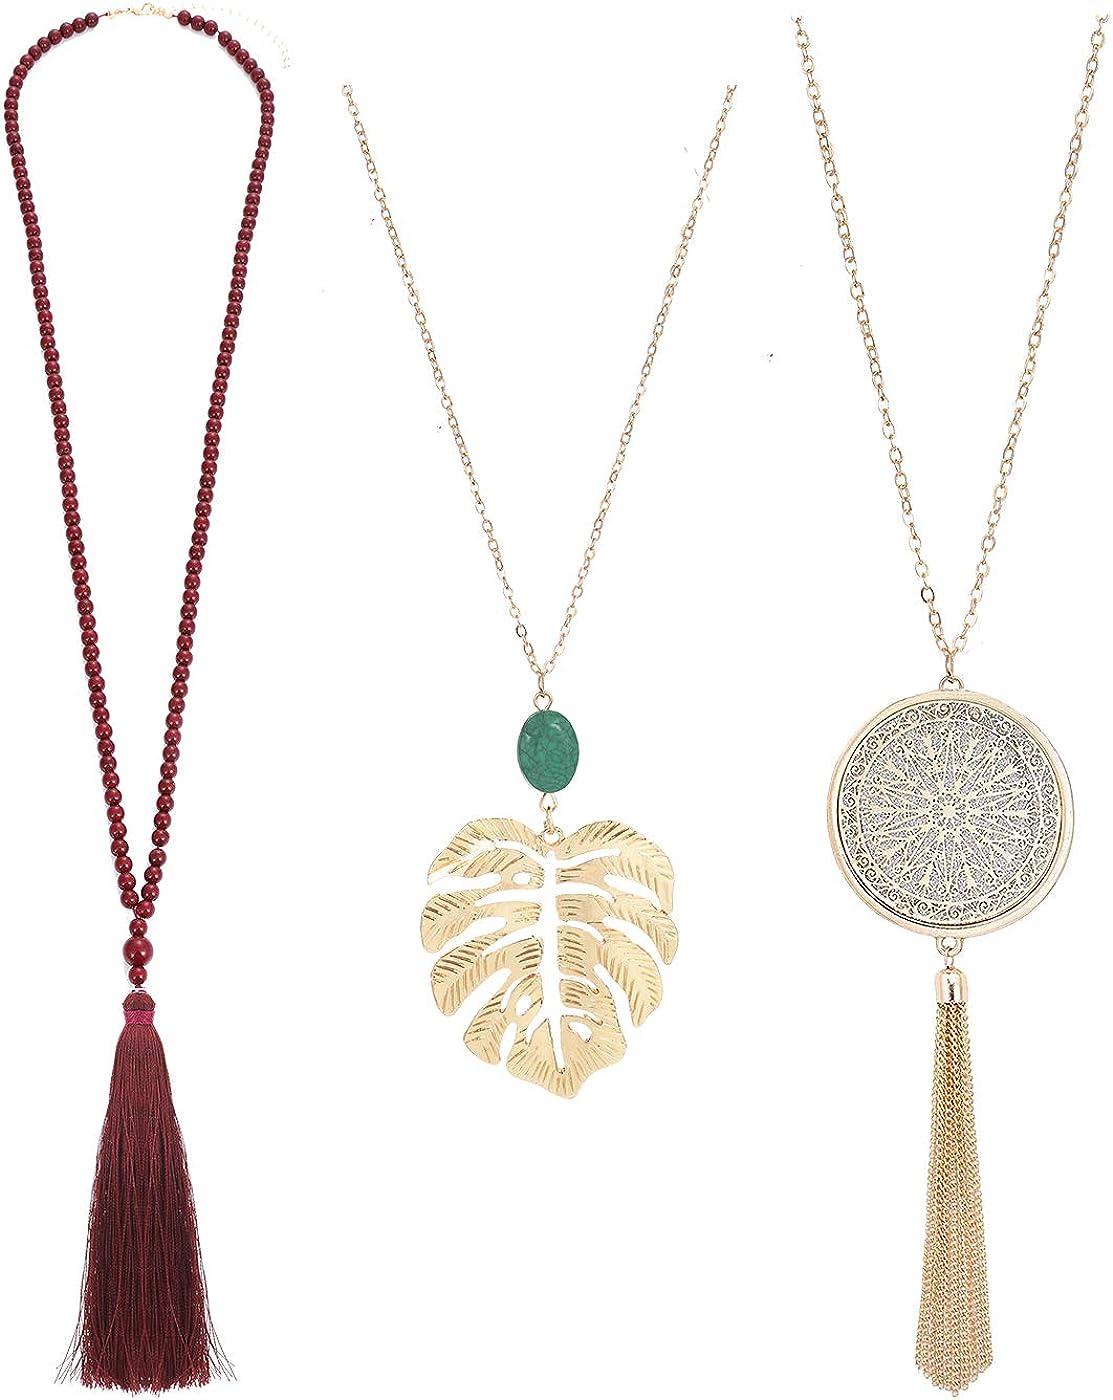 HSWE Long Pendant Necklace for Women Beaded Leaf Necklace Tassel Pendant Necklace Set Sweater Lariat Necklace (3 PCS)